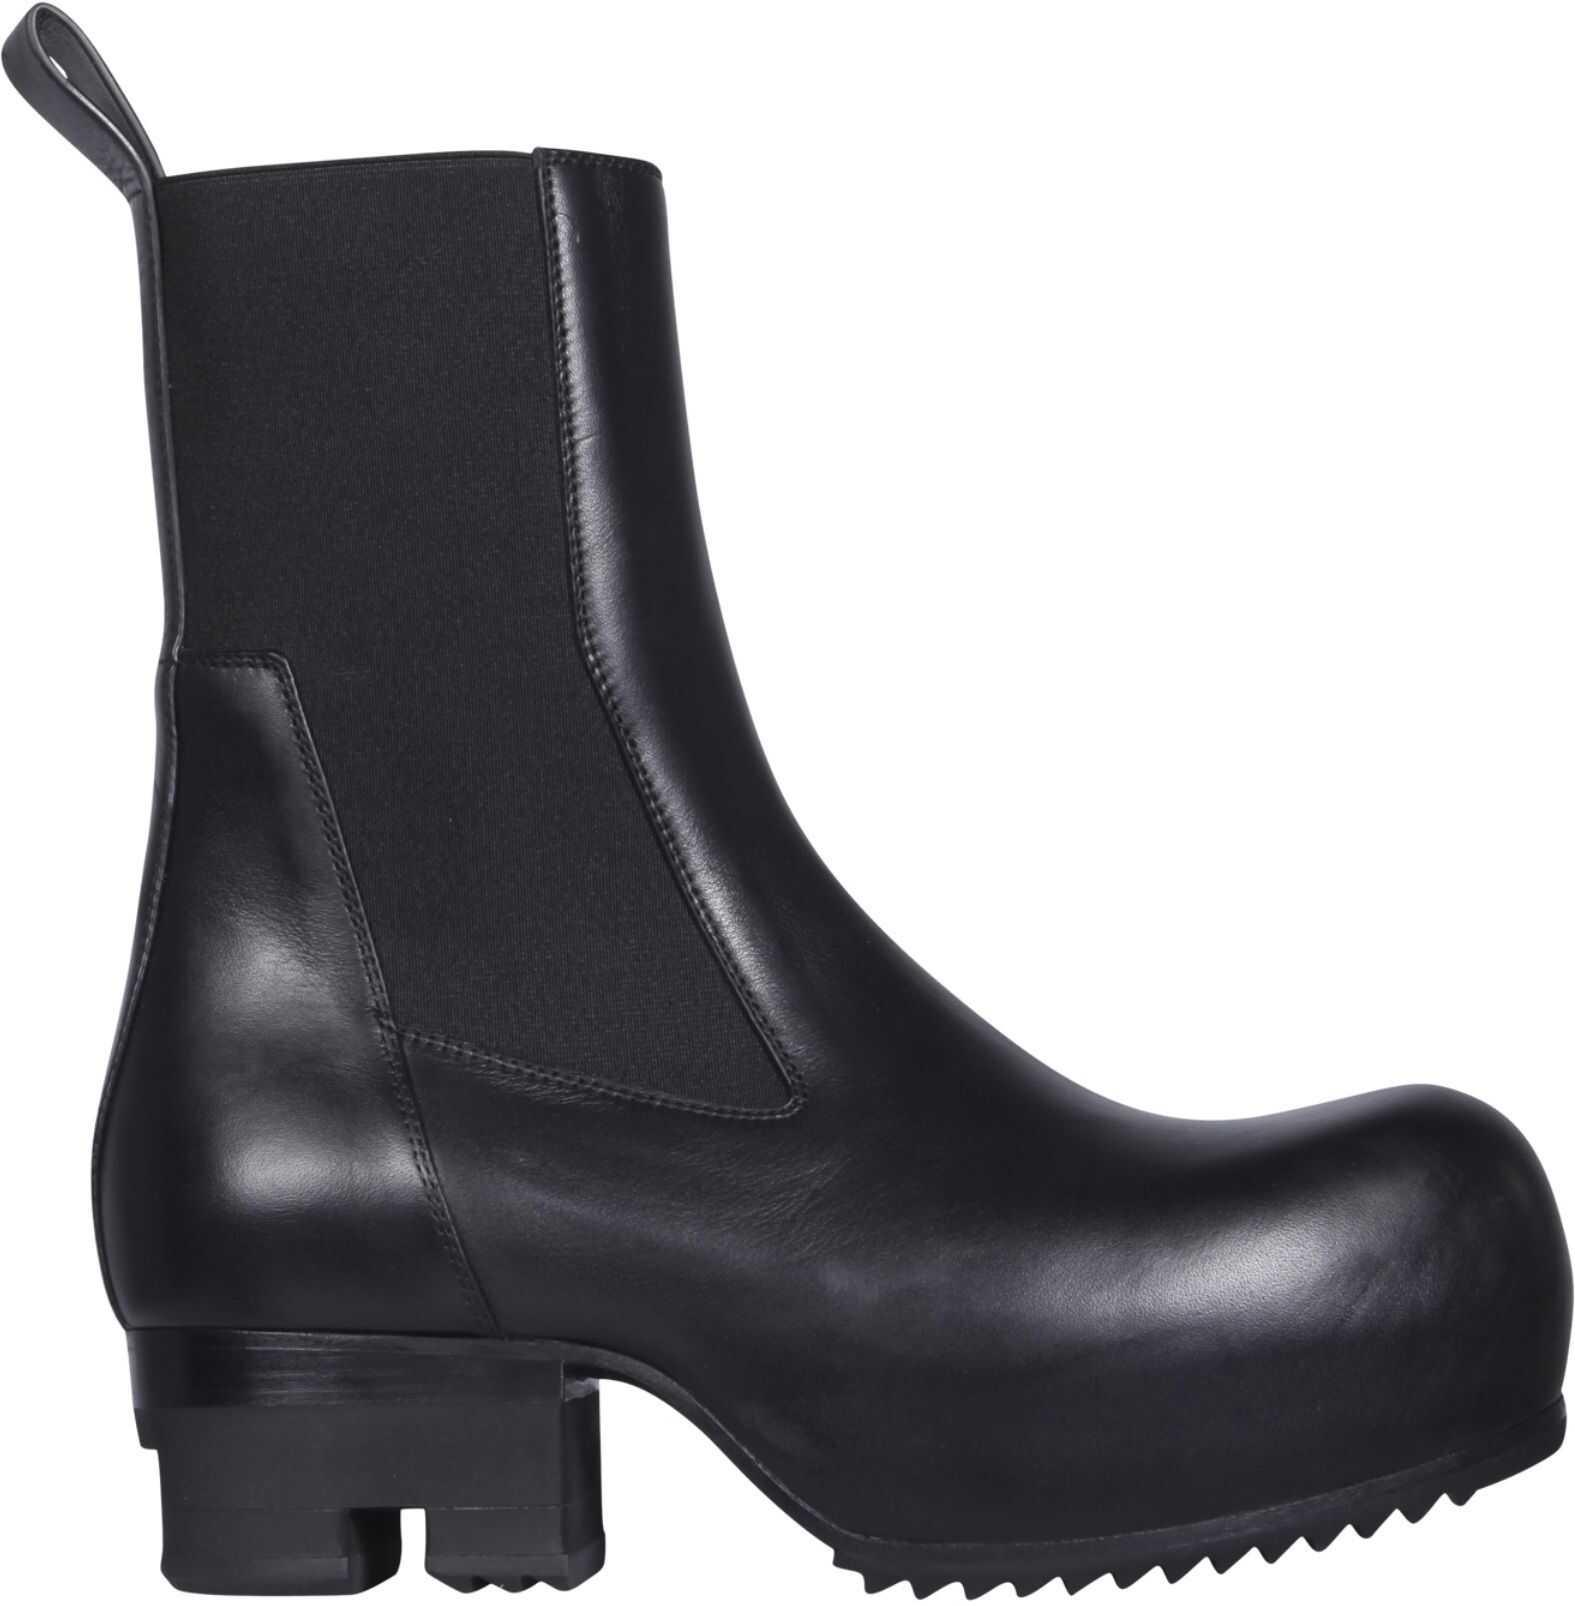 Rick Owens Leather Boots RO21S3824_LBO09 BLACK imagine b-mall.ro